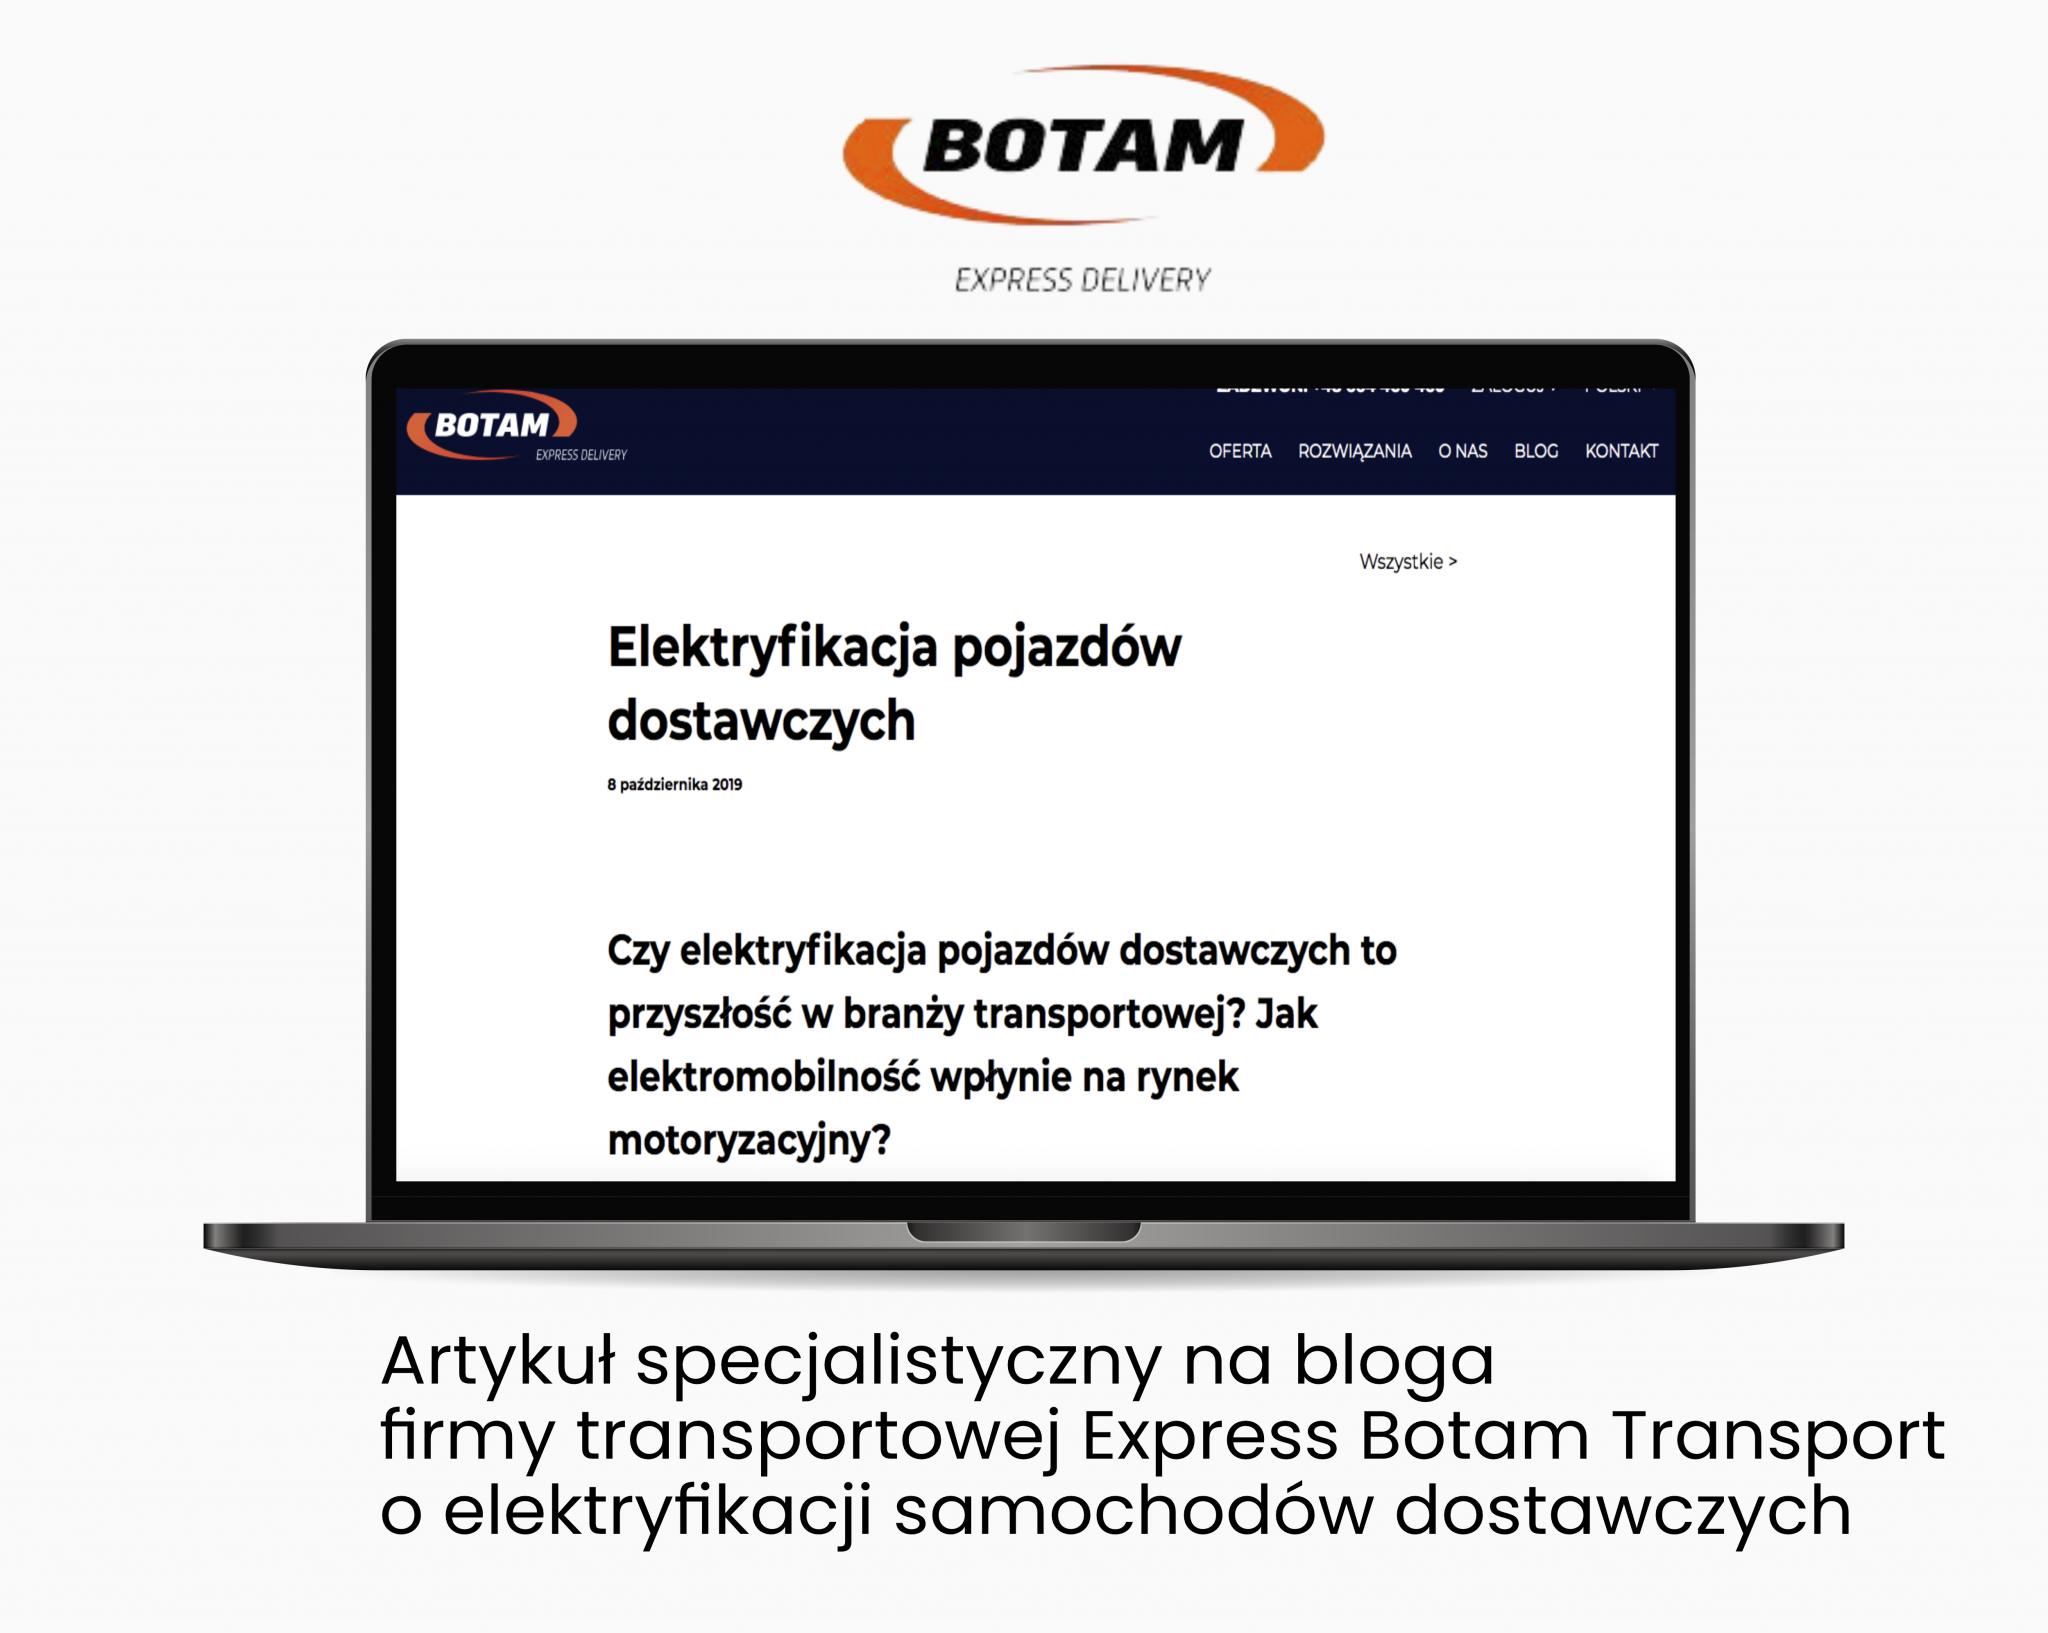 Express Botam Transport – Verbal Fairy  - Portfolio copywriterskie Verbal Fairy